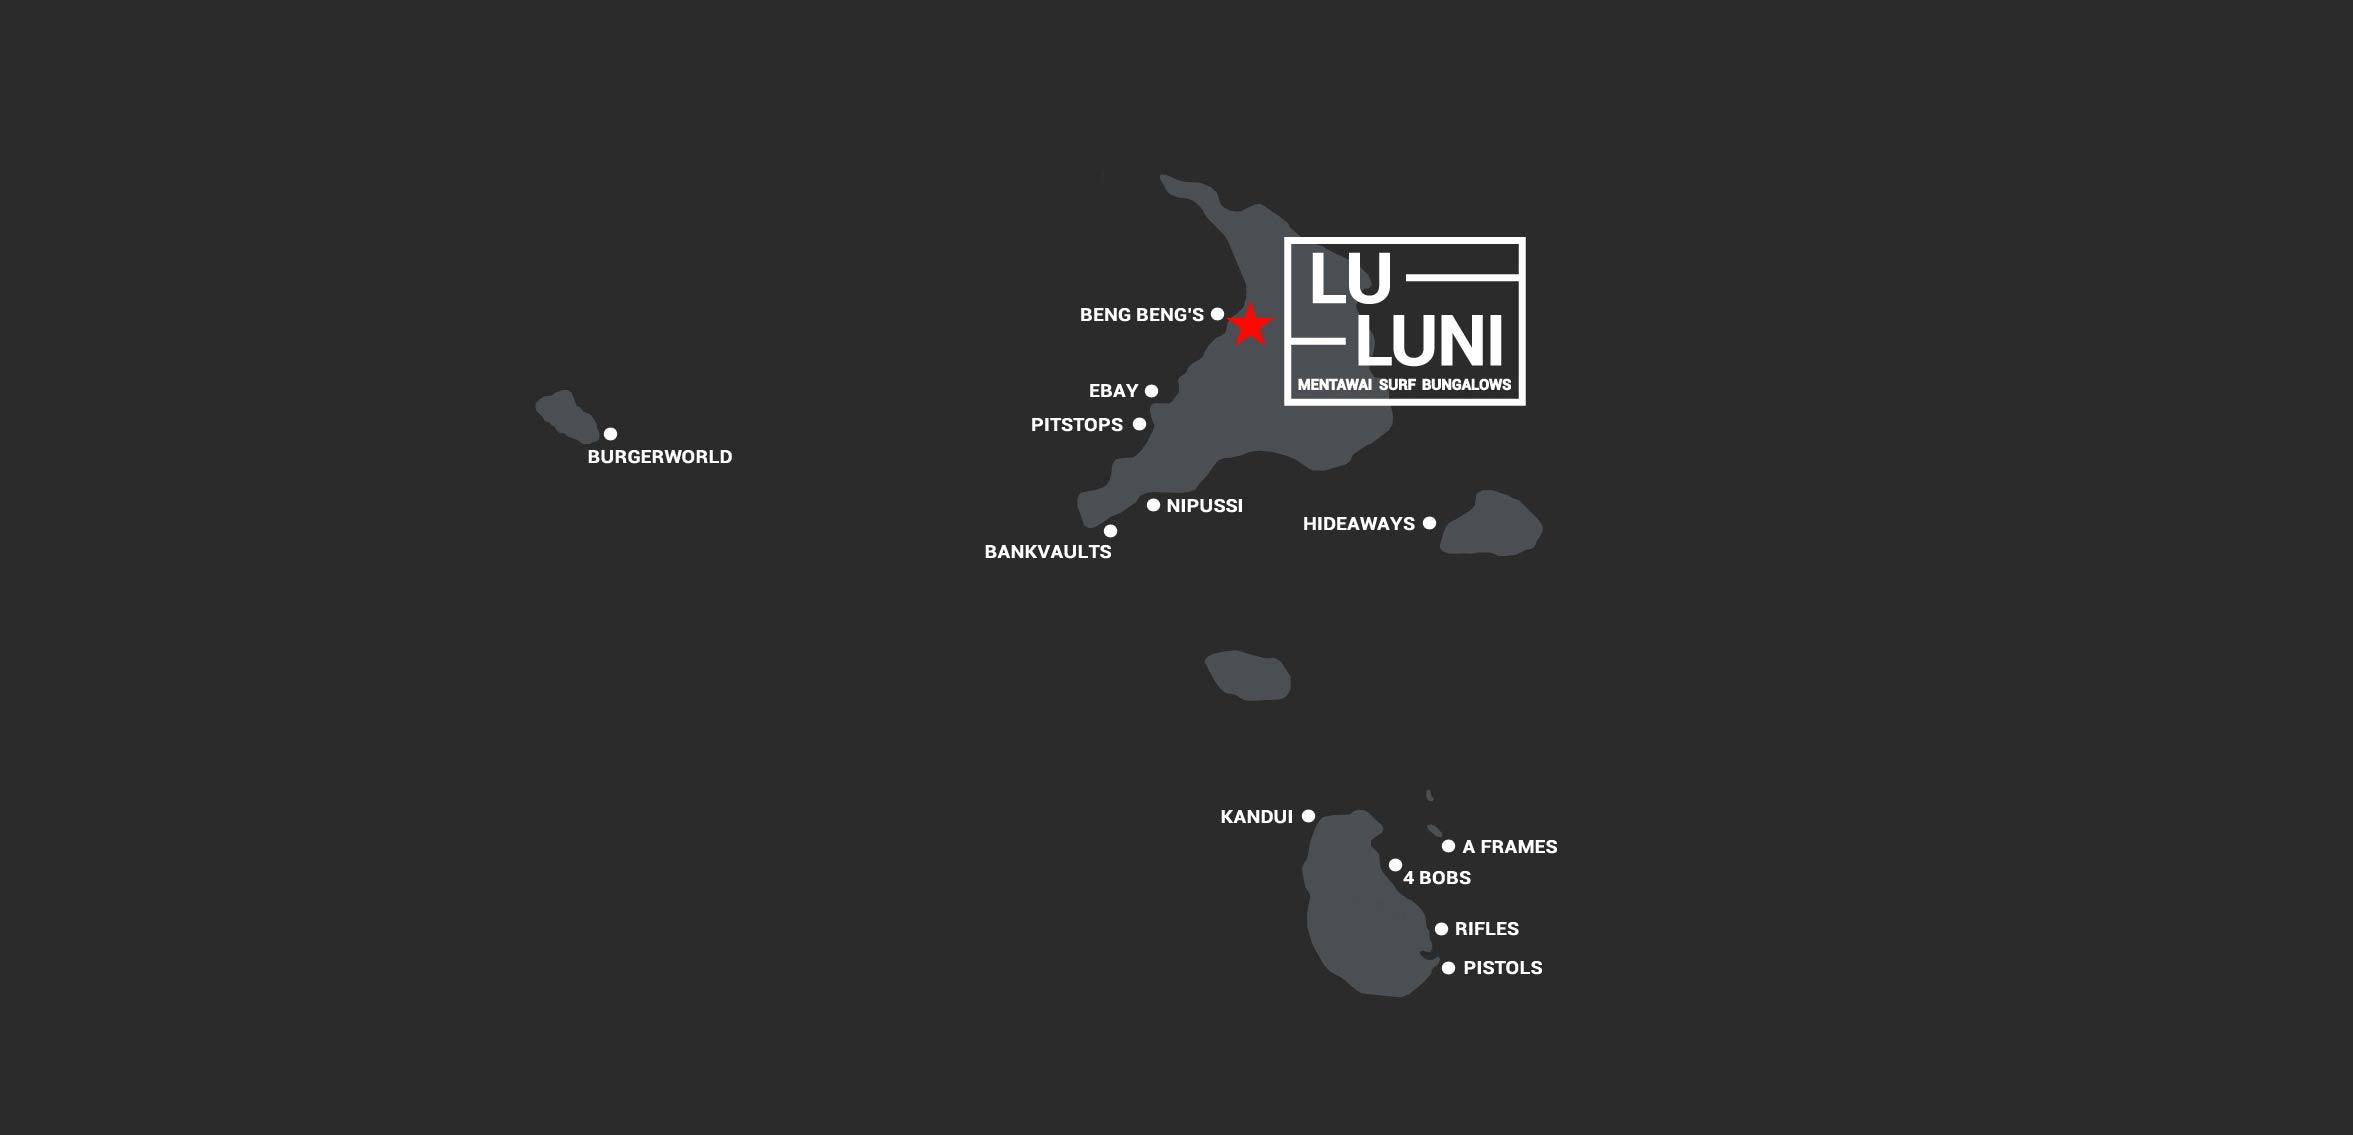 Luluni